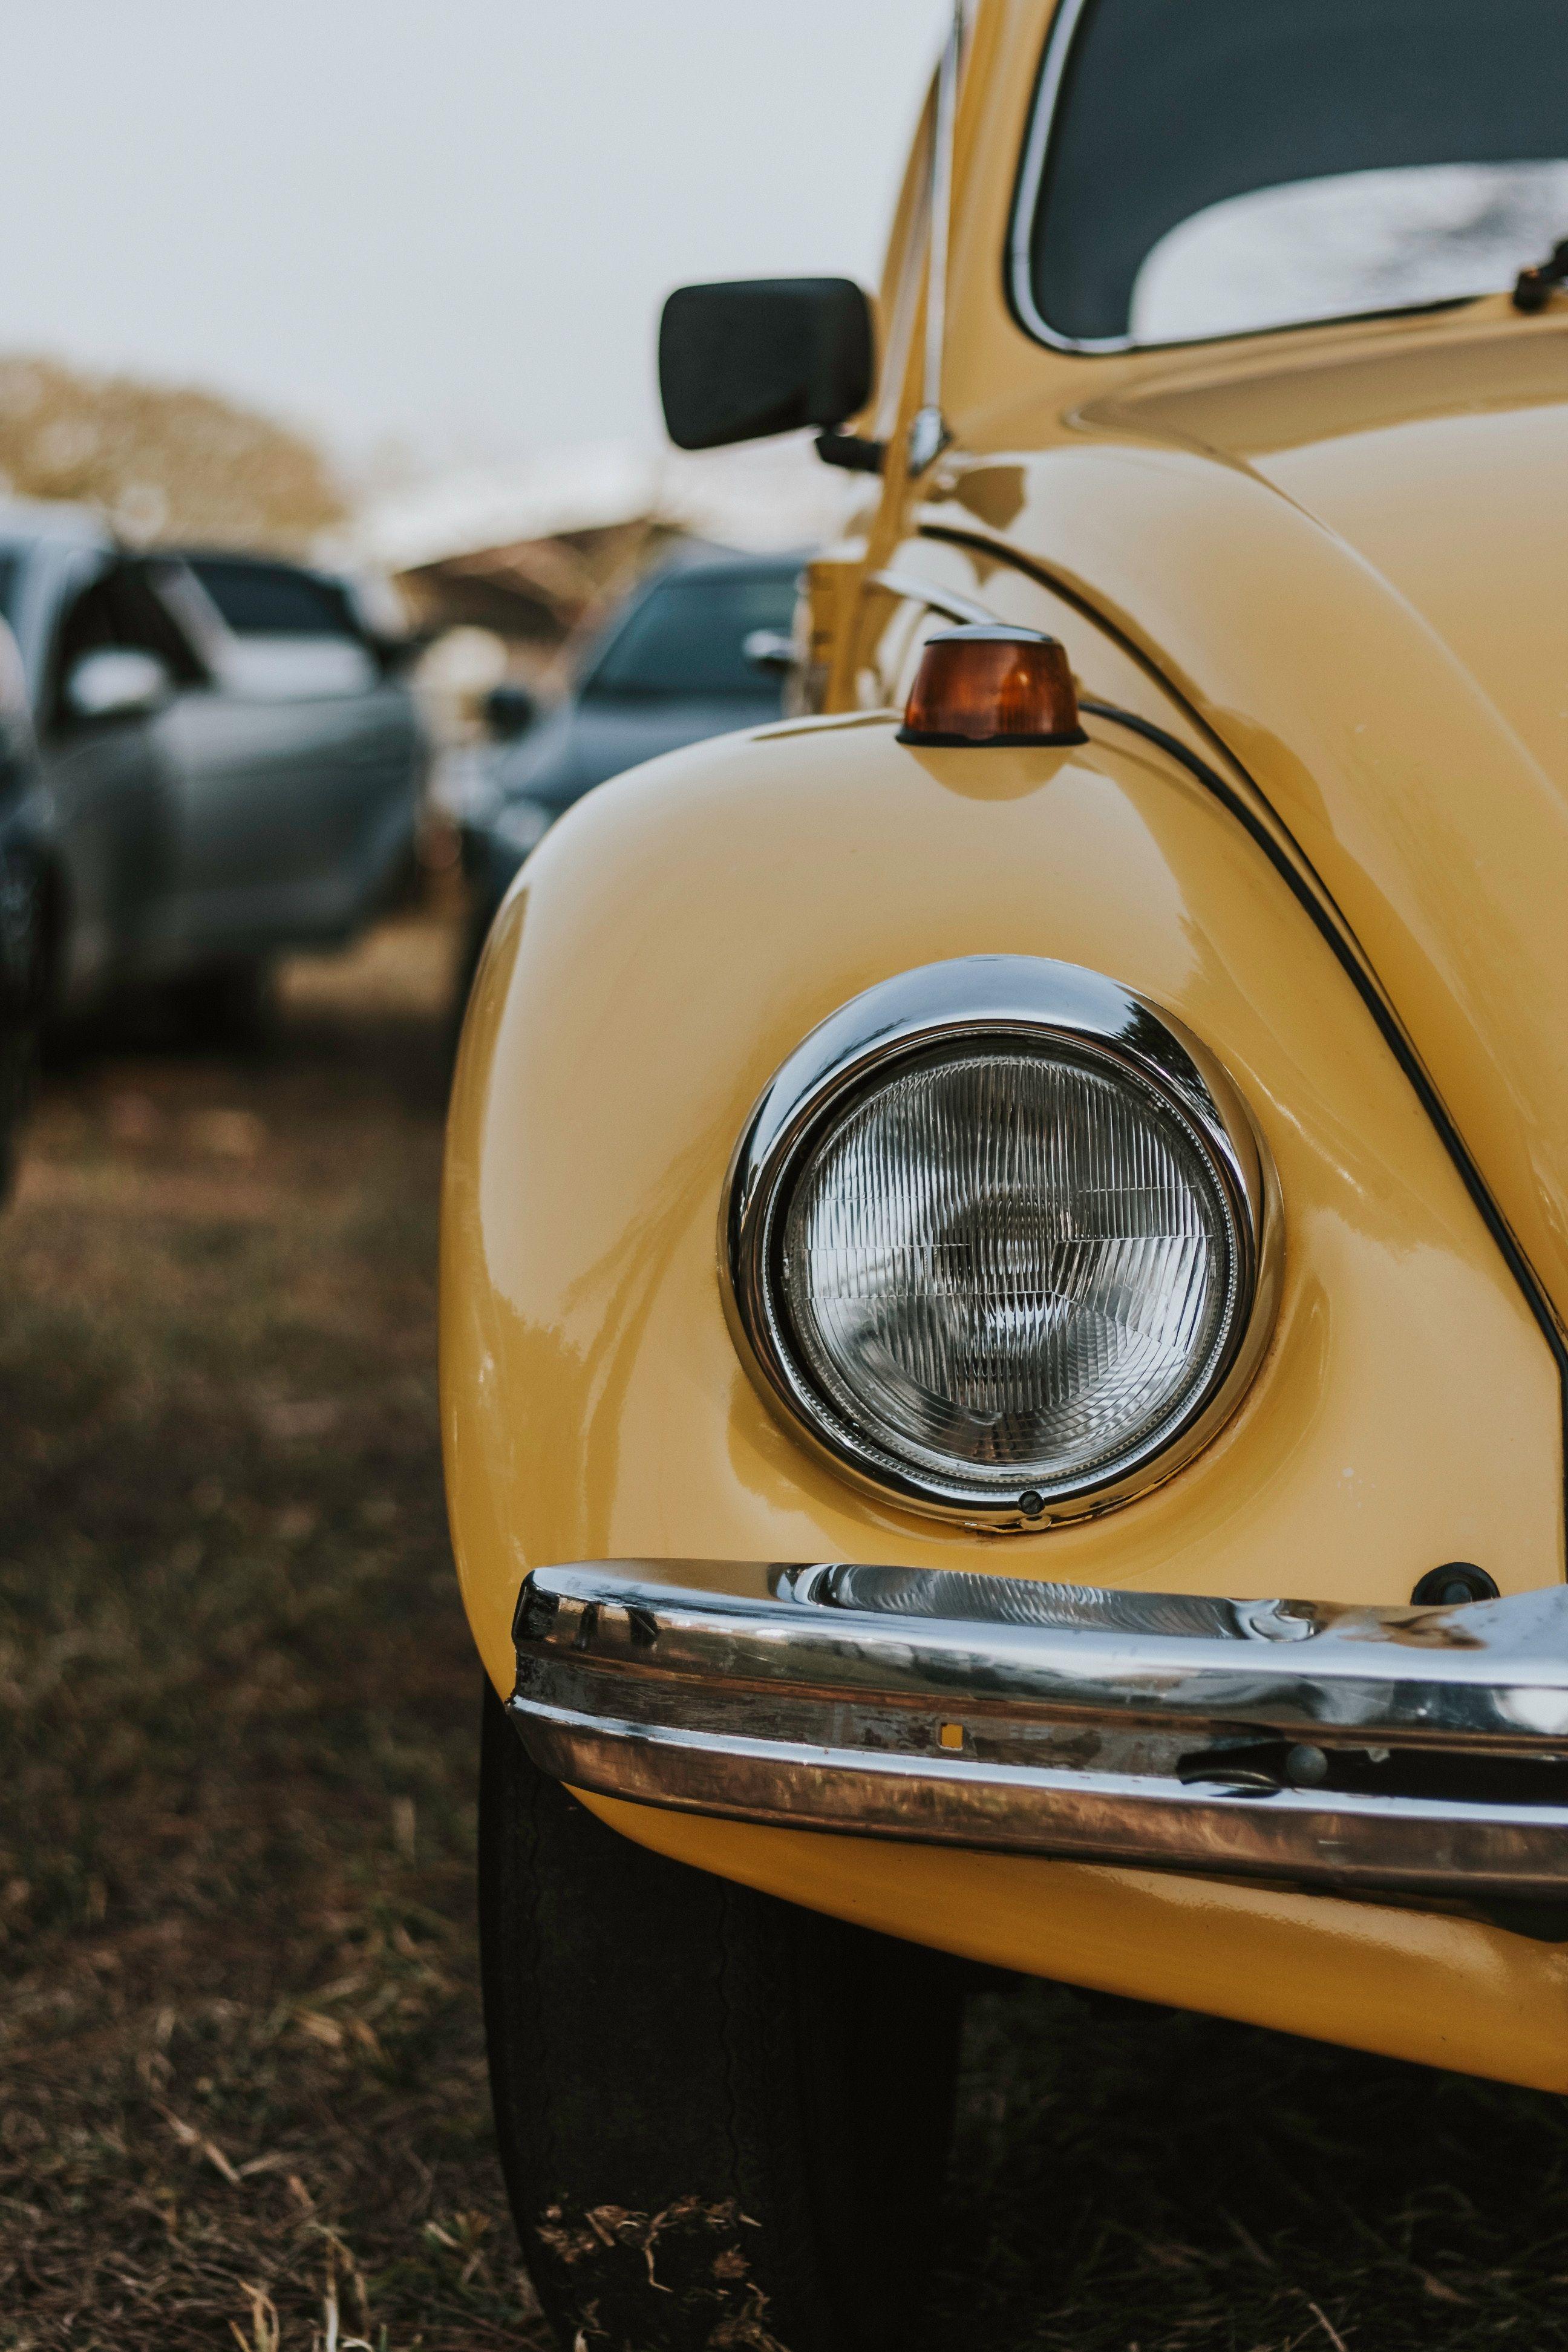 Get More Car Wallpaper Hd Collections On Autospix Com Imagens De Fusca Fusca Amarelo Wallpapers Carro